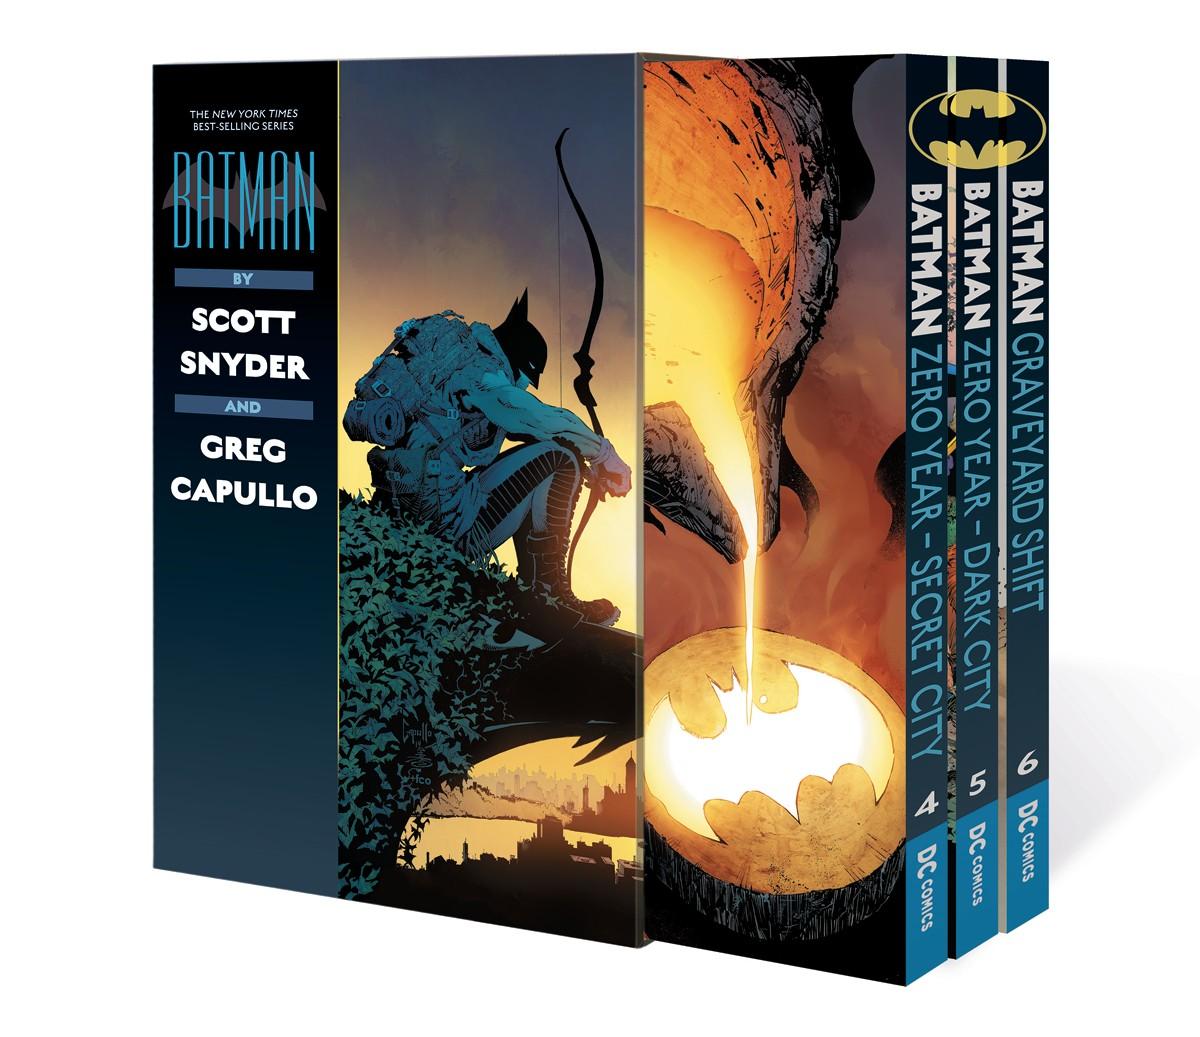 BATMAN BY SCOTT SNYDER AND GREG CAPULLO GRAPHIC NOVEL BOX SET 2